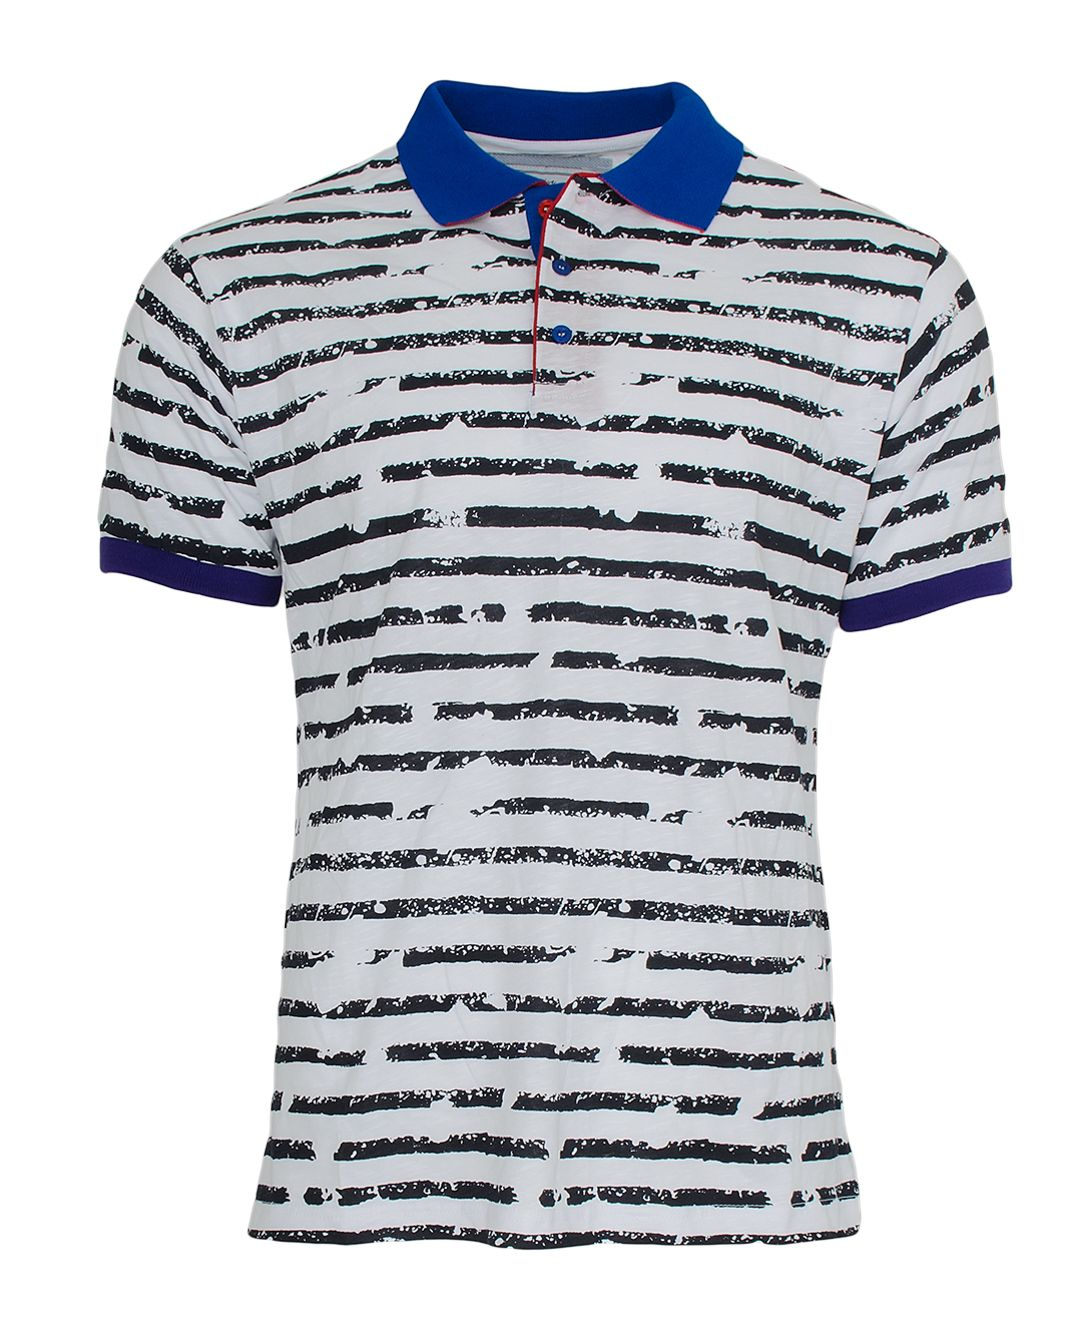 65e5cca4cfba Κοντομάνικη άσπρη ανδρική polo μπλούζα με μαύρες οριζόντιες γραμμές και  μπλε γιακά